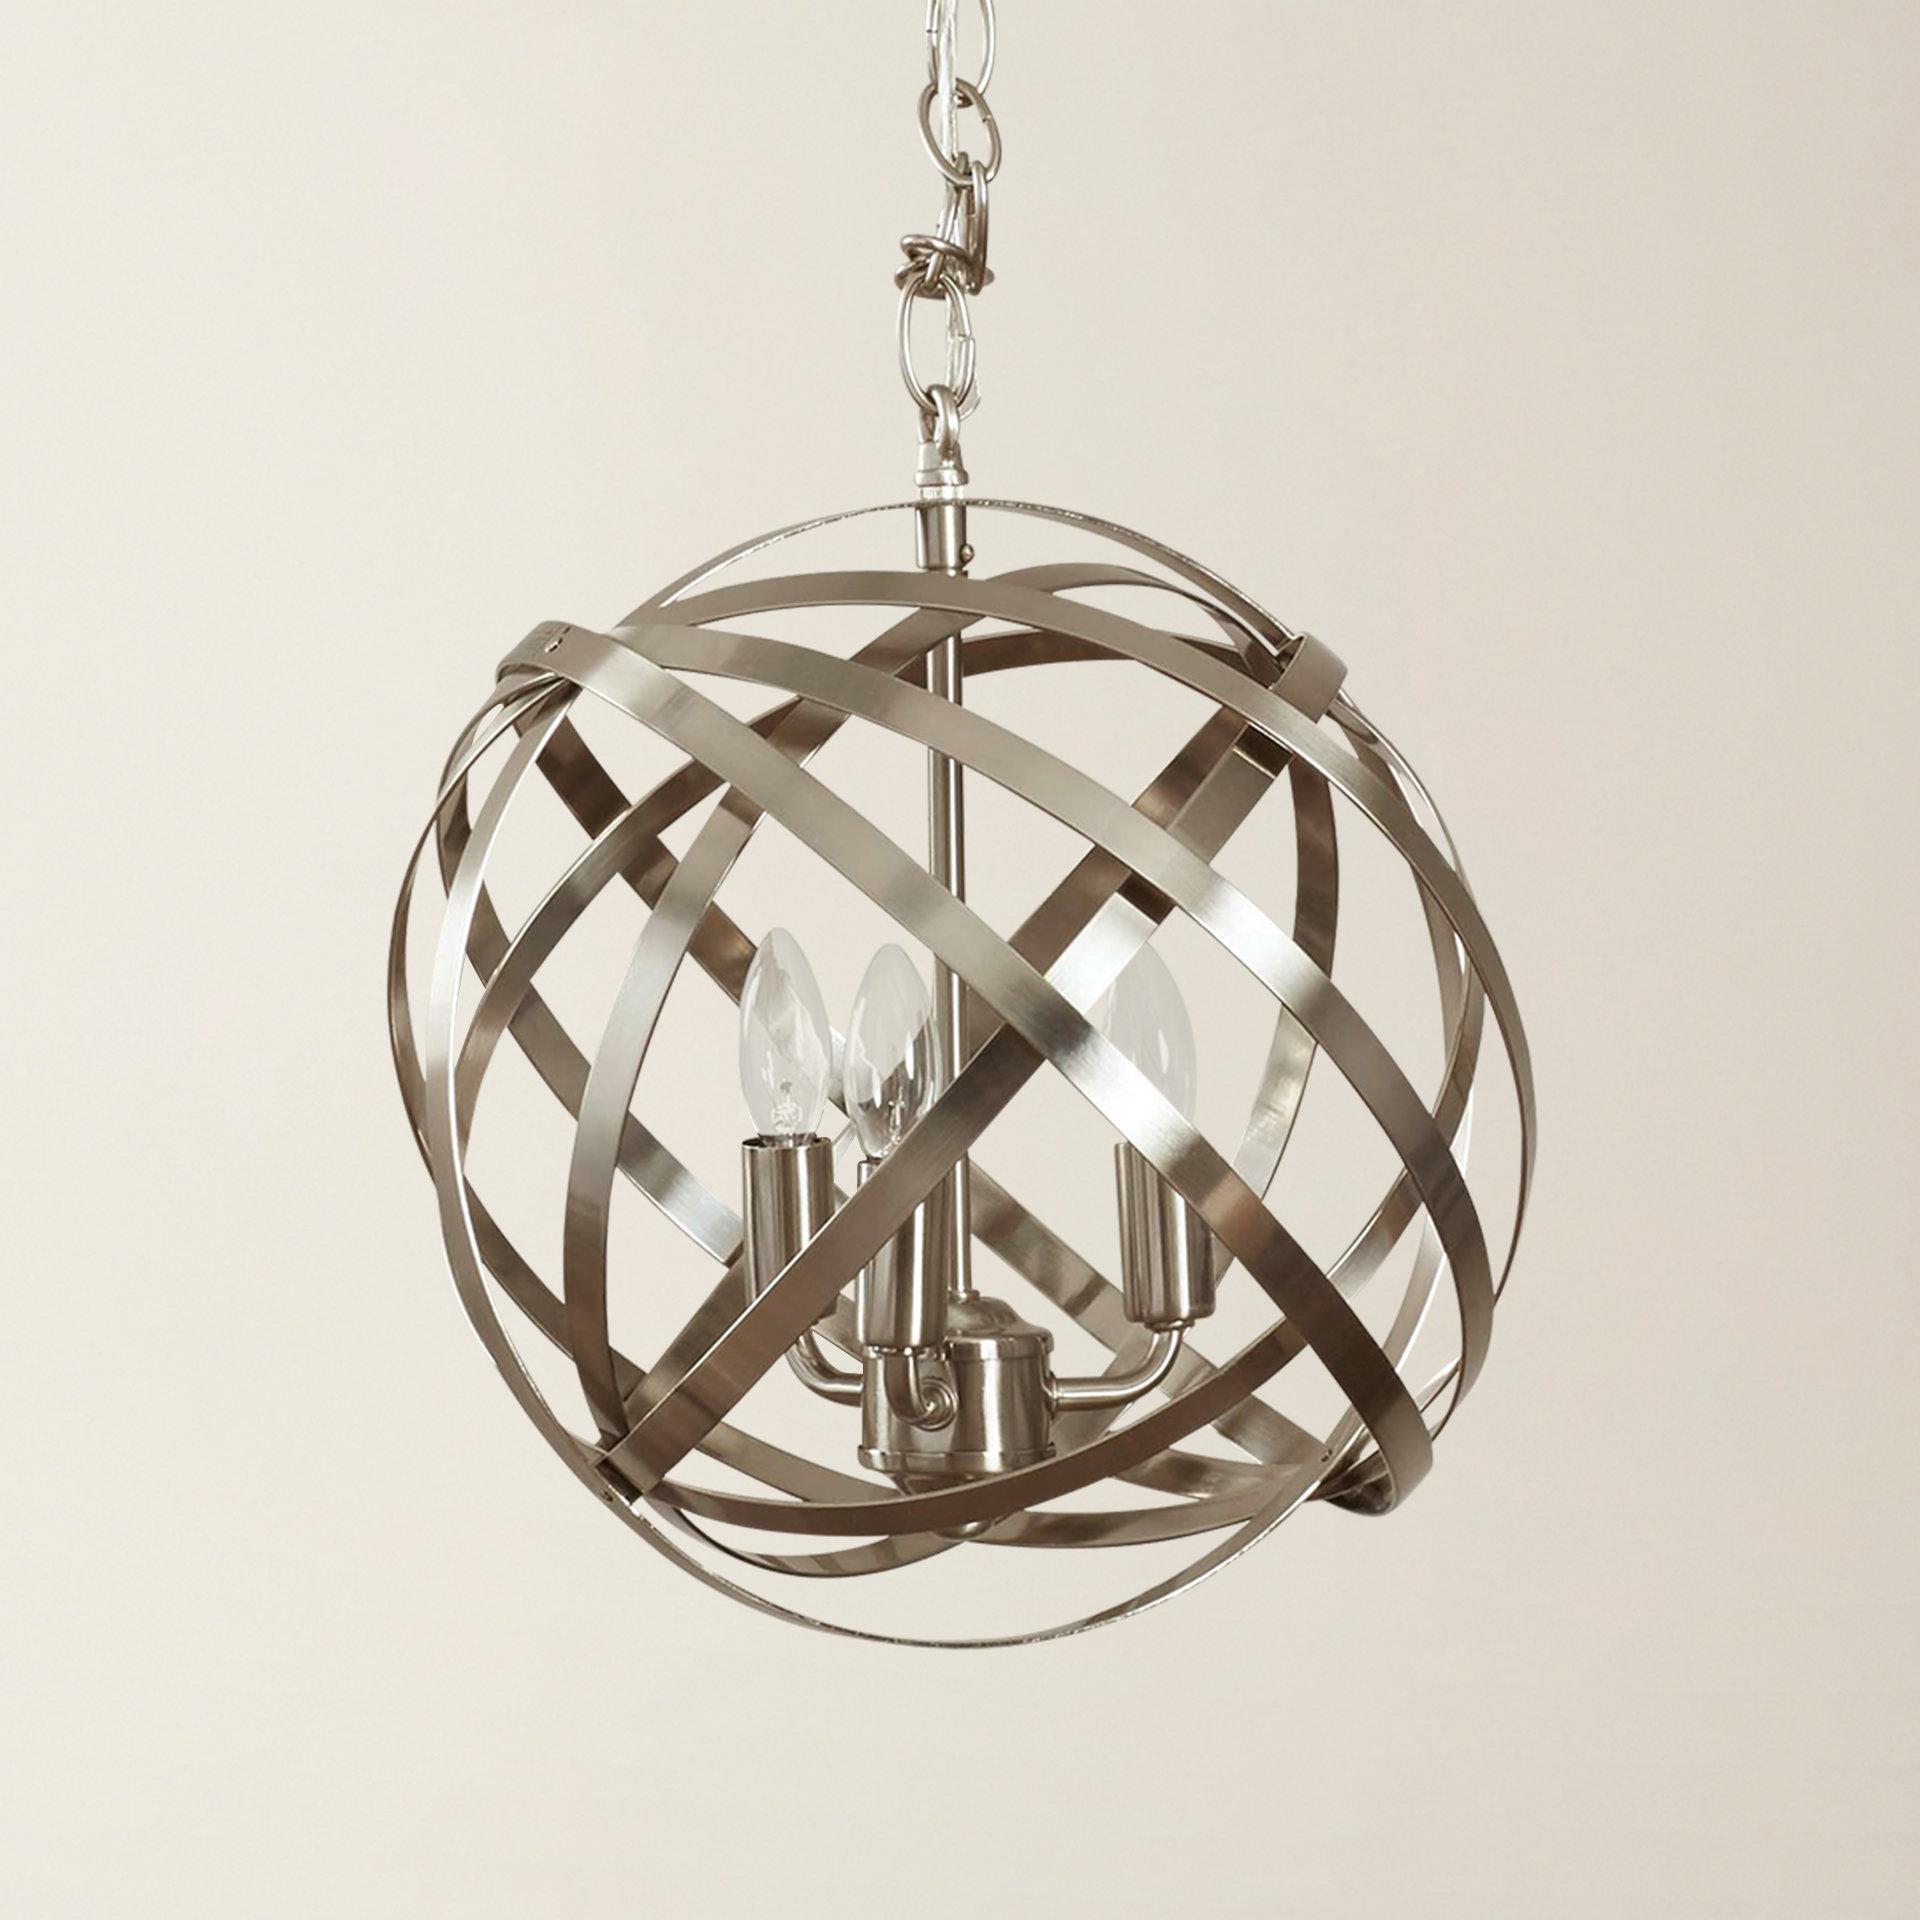 2020 Adcock 3-Light Single Globe Pendants regarding Publicado Adcock 3-Light Single Globe Pendant